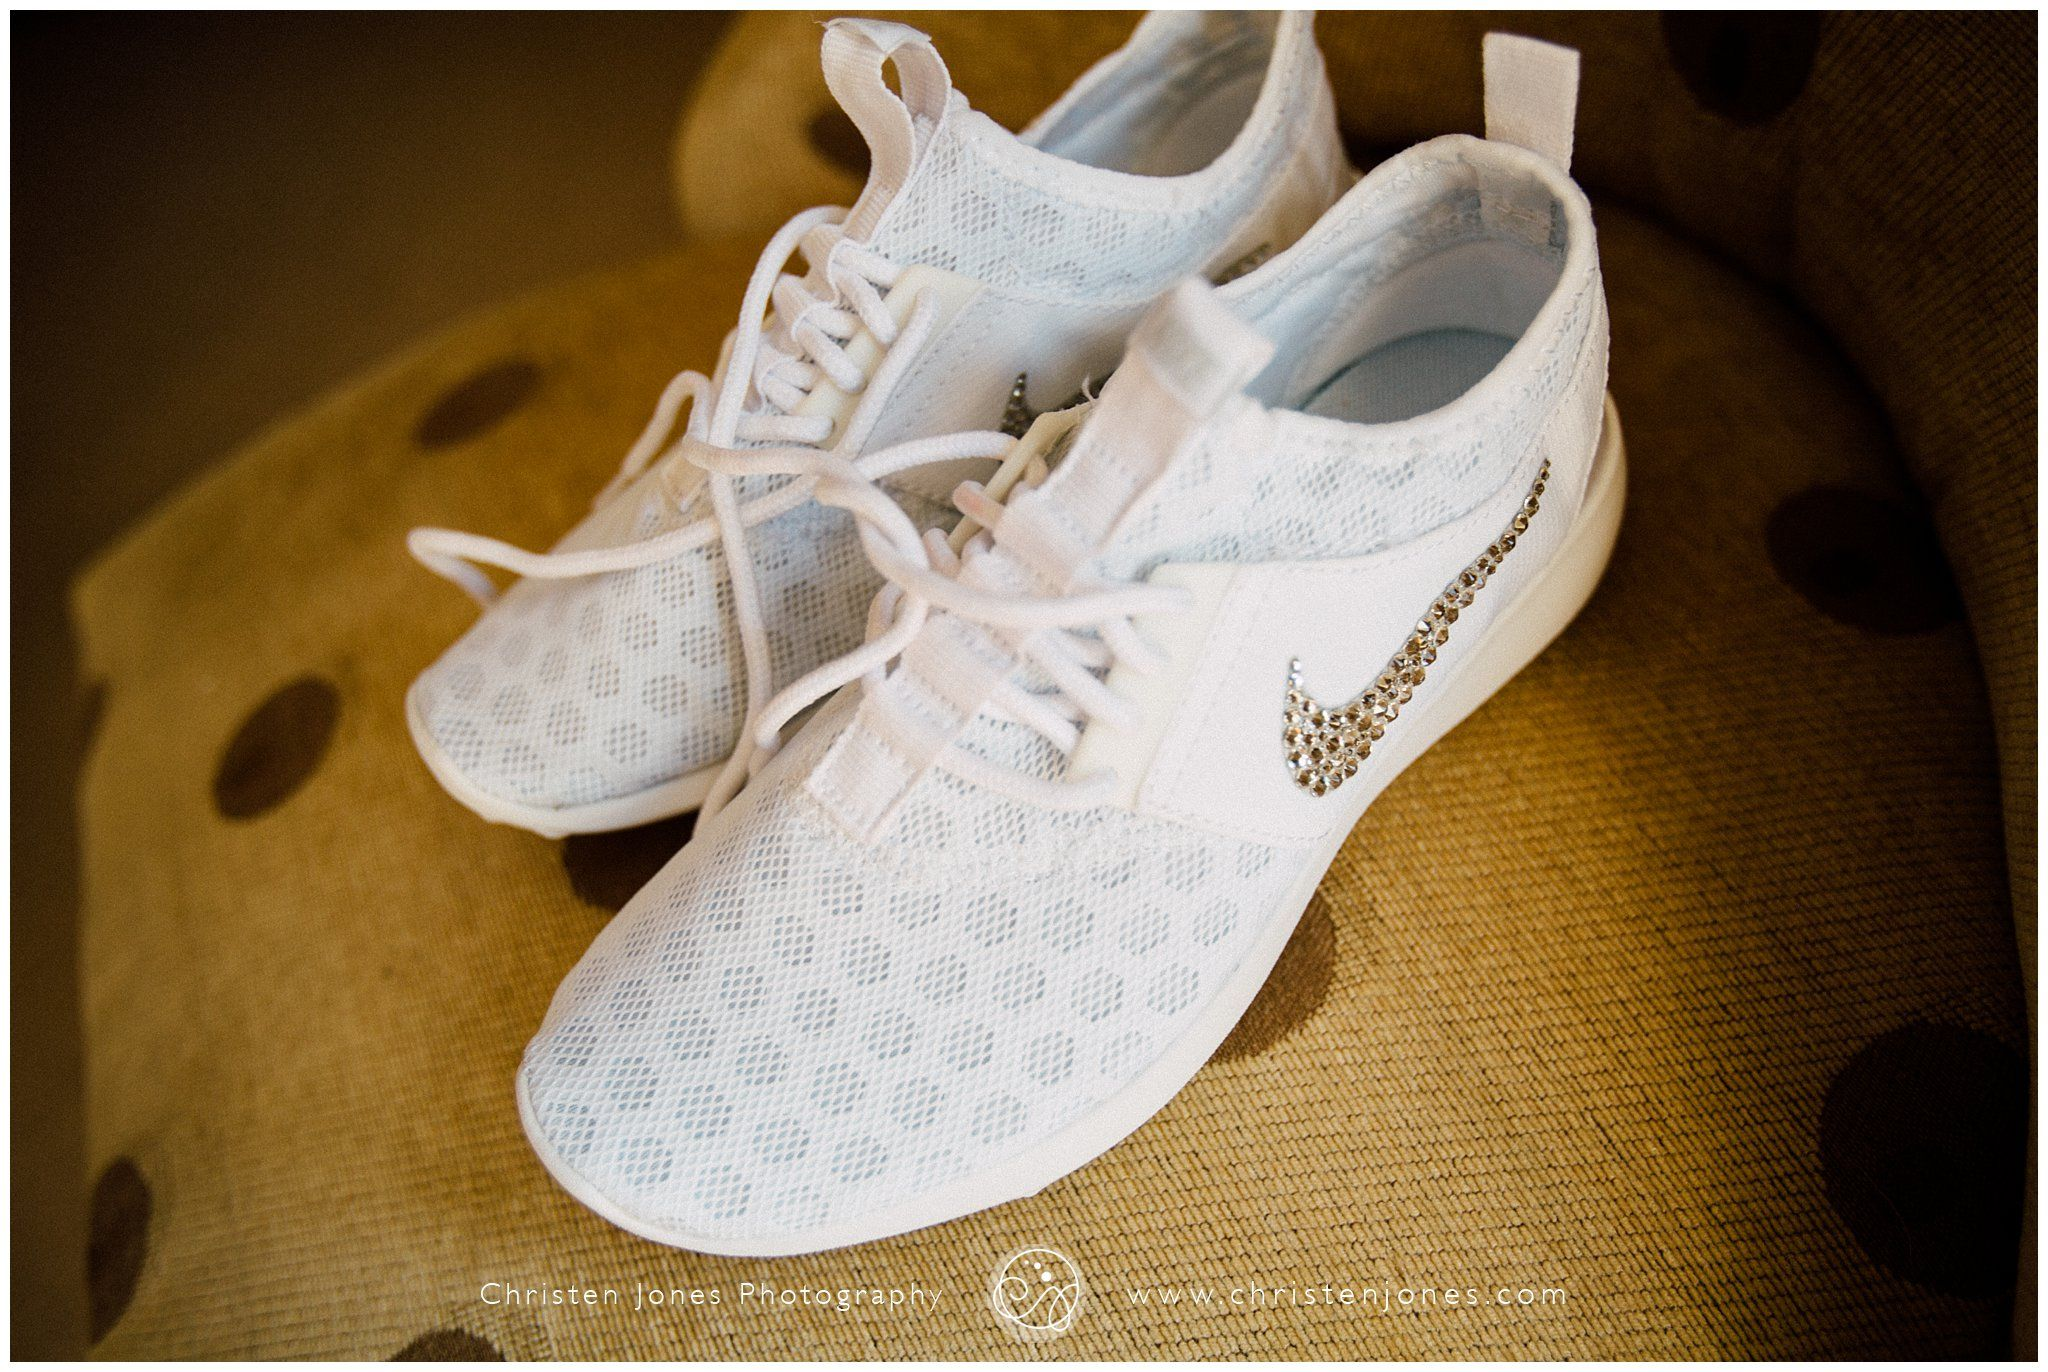 Wedding Day Nike White Nike Shoes Sparkley Nike Swish Nike Bride Shoes Wedding Day Sneakers Wedding Shoes Sneakers Wedding Sneakers Bride Sneakers